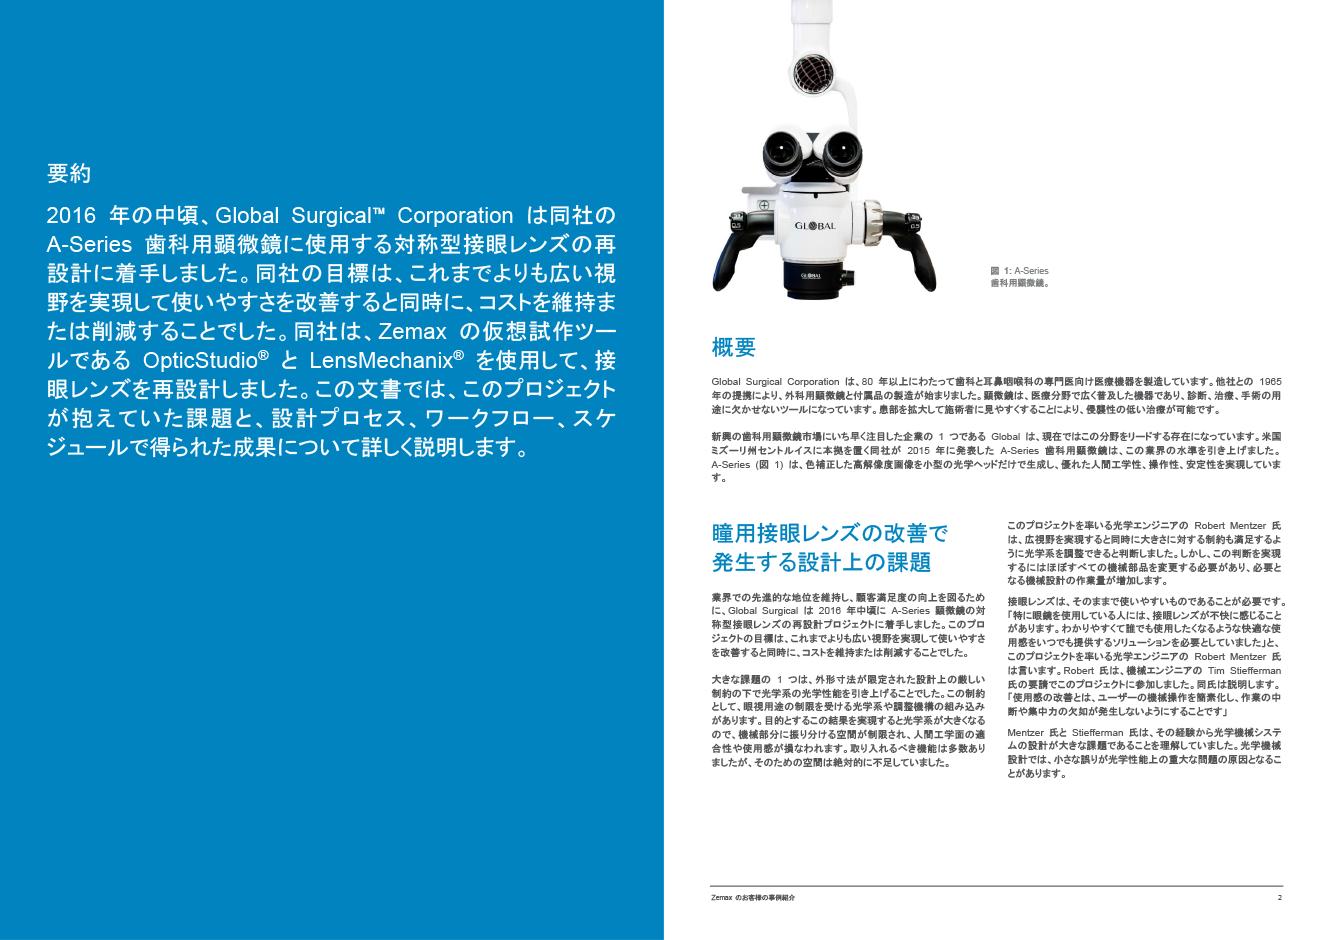 Zemax Virtual Prototyping を使用して製品開発時間を短縮した Global Surgical - 日本 Sneak Preview